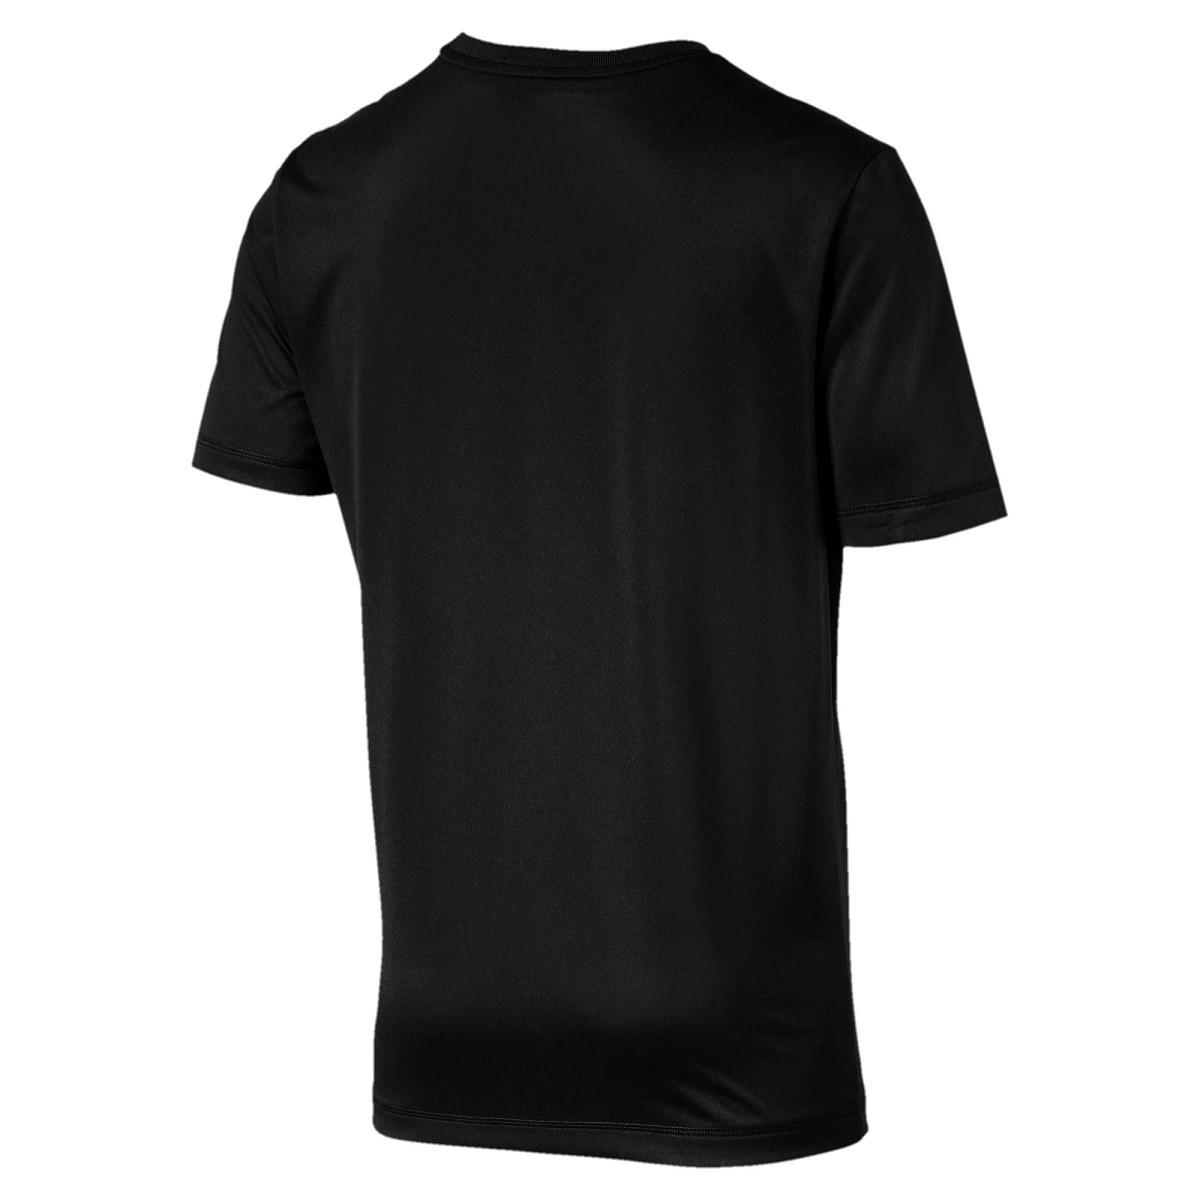 Camiseta Puma Active Tee Masculina Preto